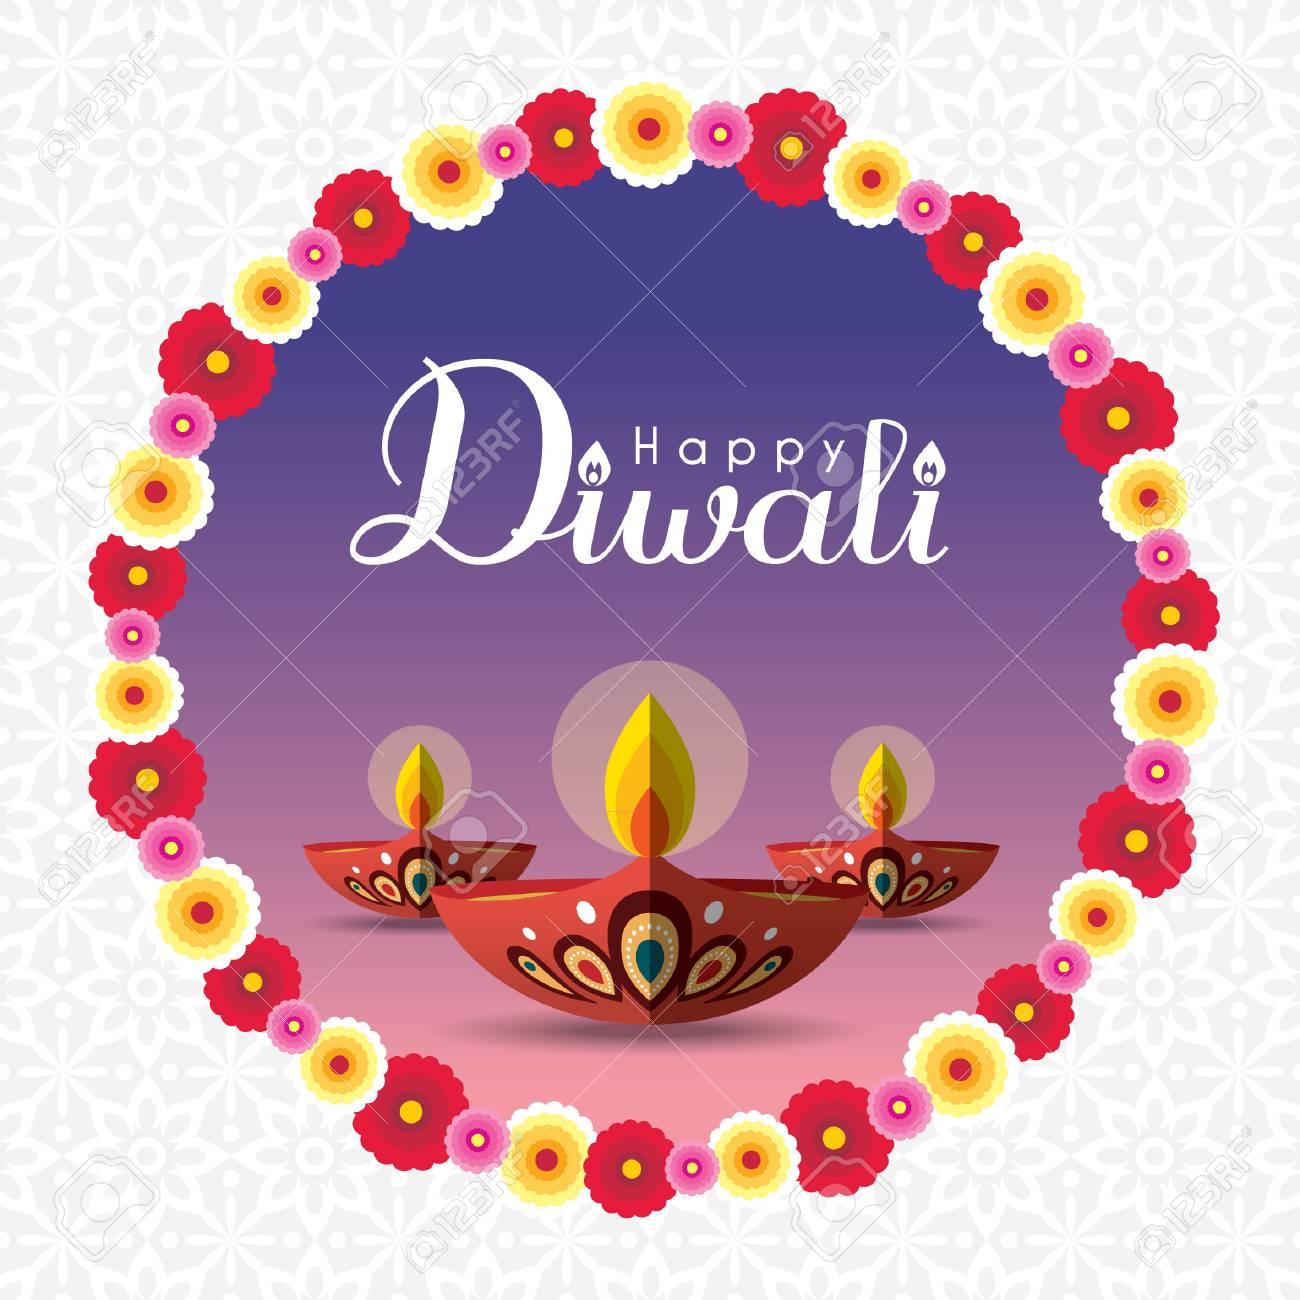 Diwali Or Deepavali Greeting With Beautiful Burning Diwali Diya